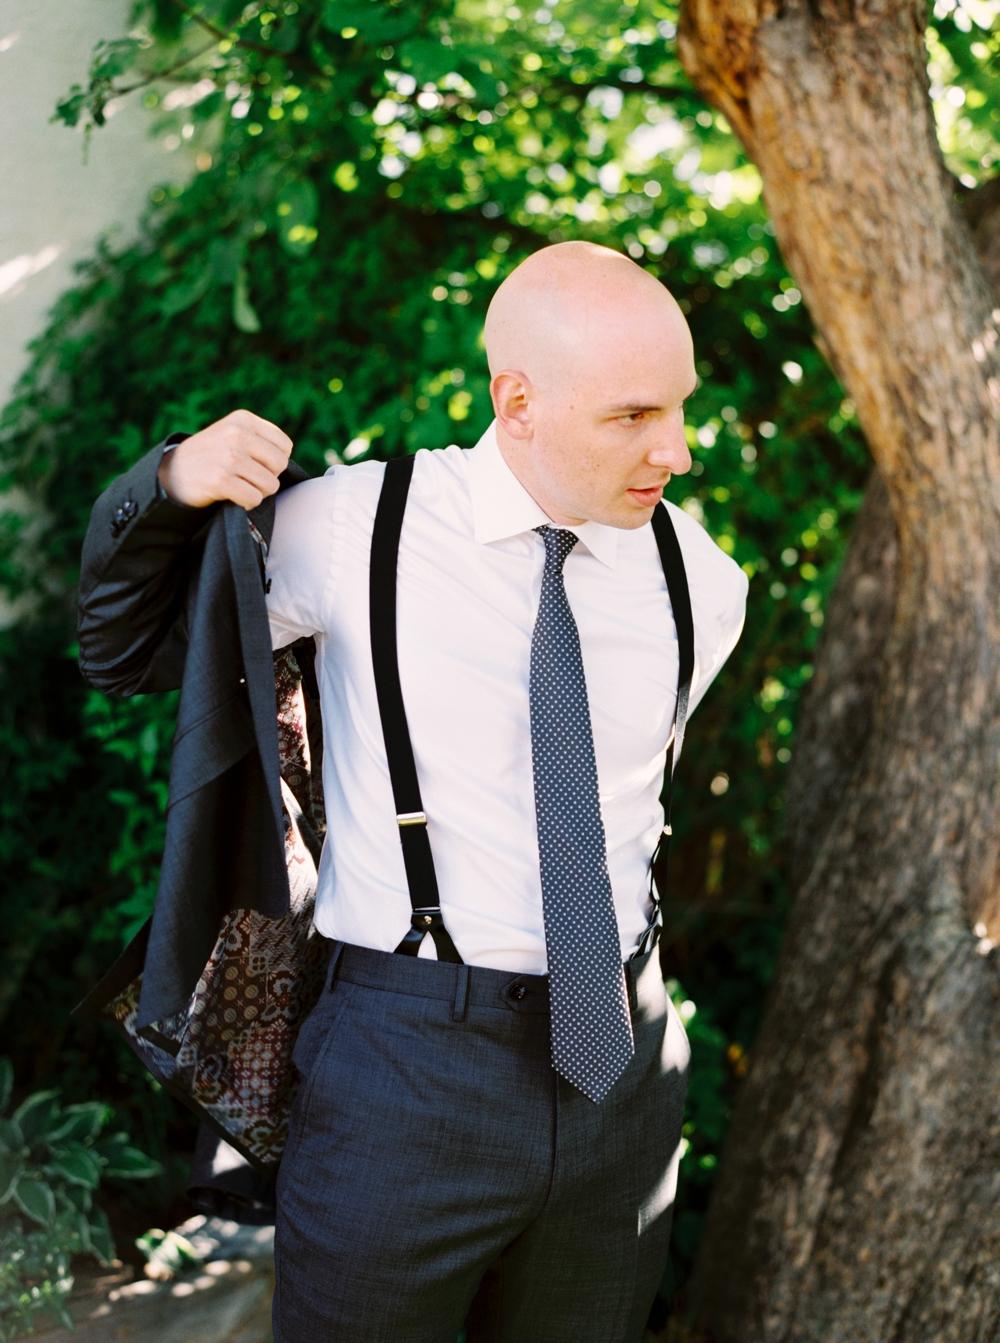 Calgary Wedding Photographer | Meadow Muse Pavilion Wedding | Canmore Photographers | Groom getting ready